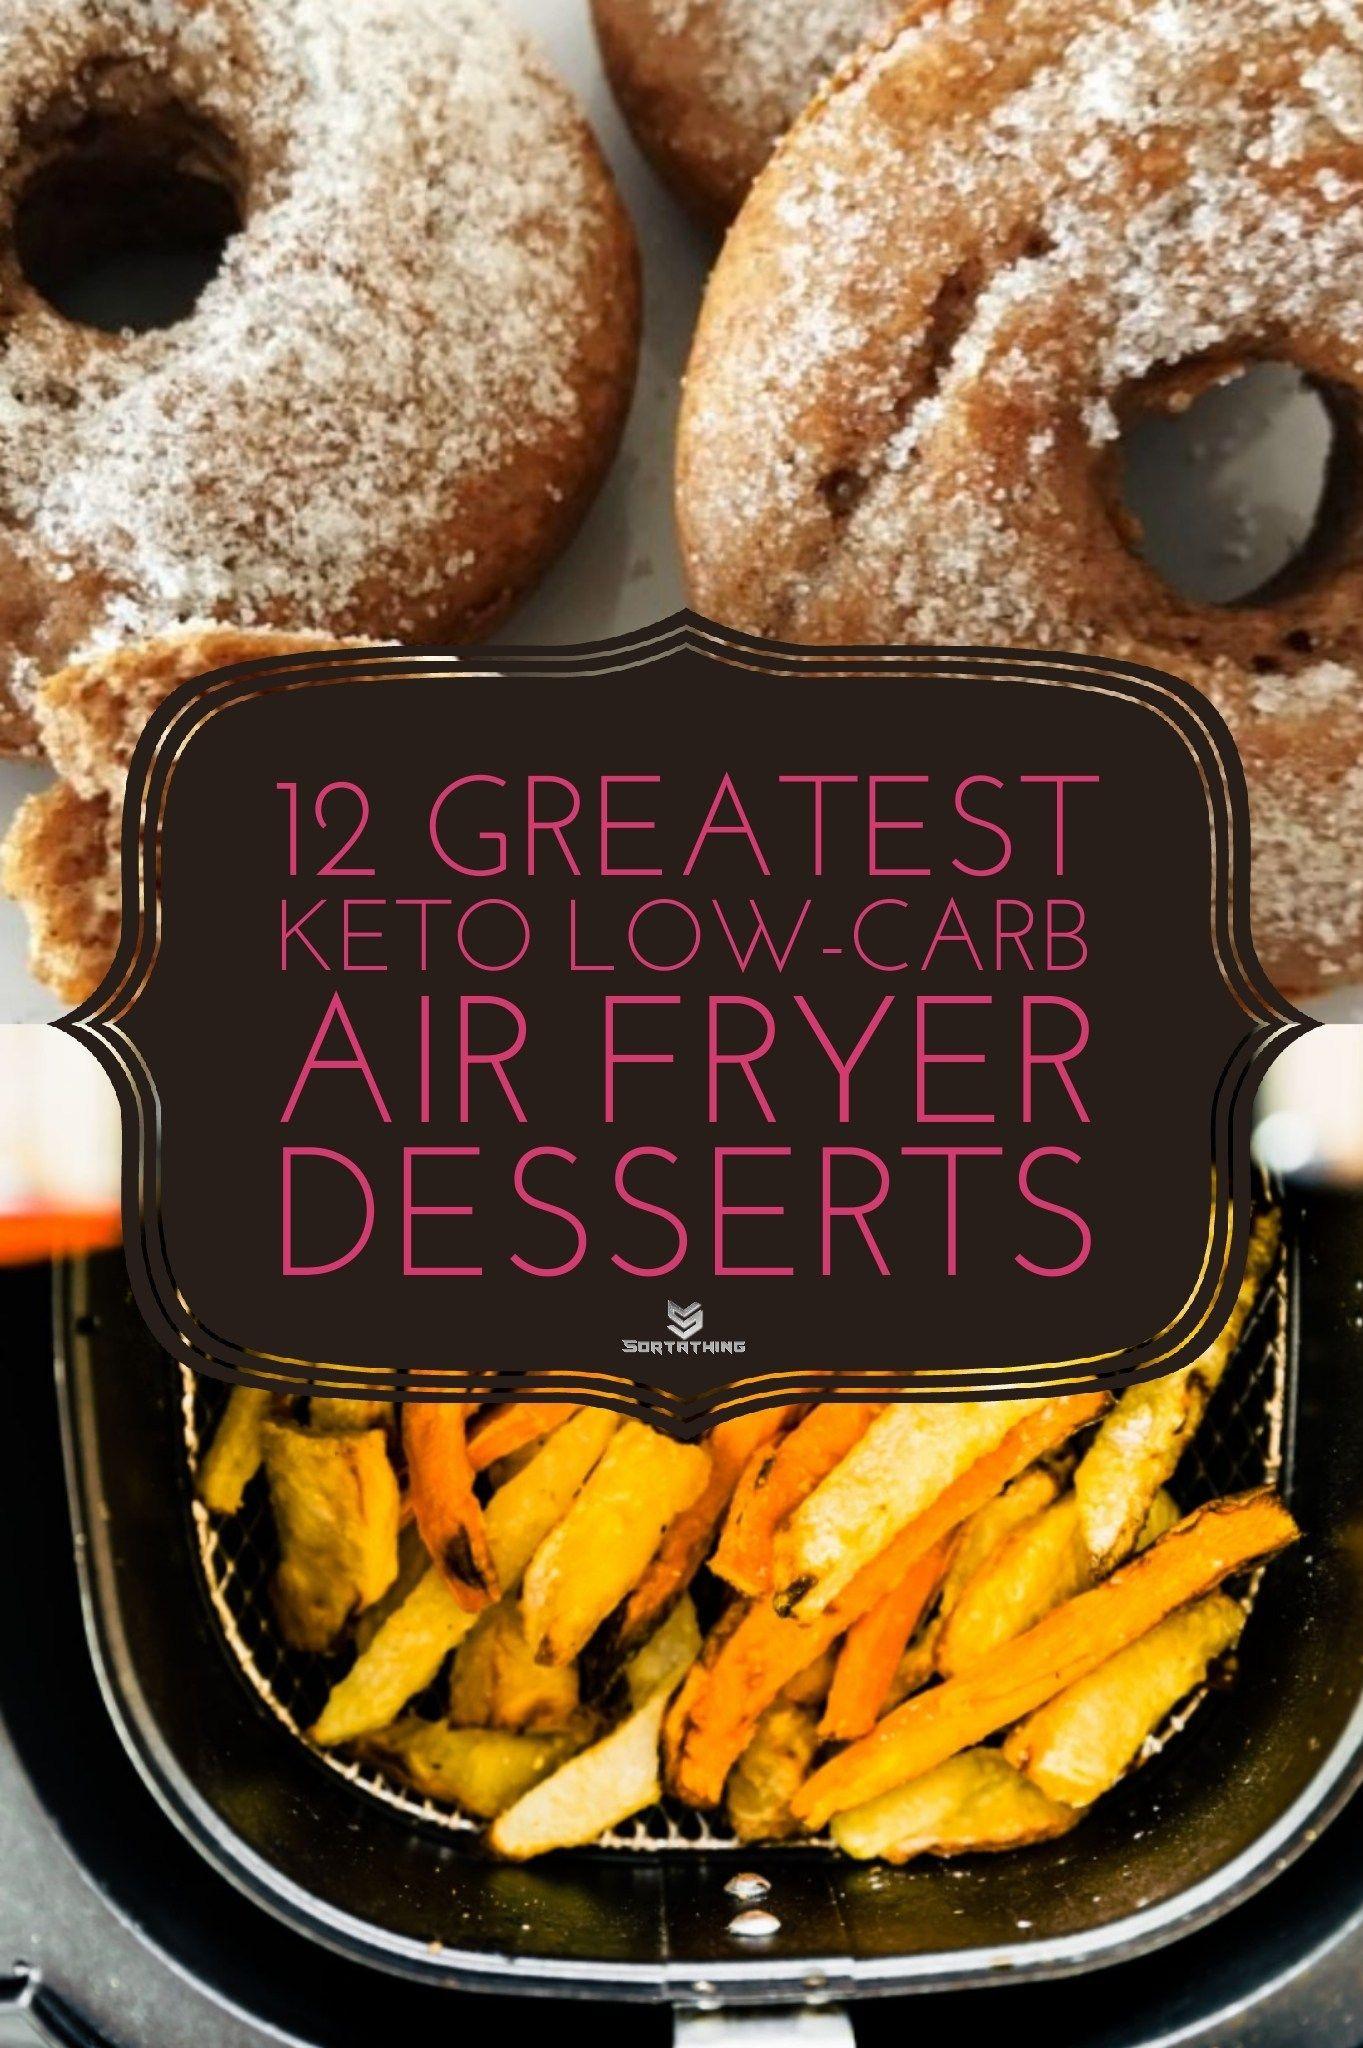 Air Fryer Keto Recipes Dessert  12 Greatest Keto Low Carb Air Fryer Dessert Recipes in